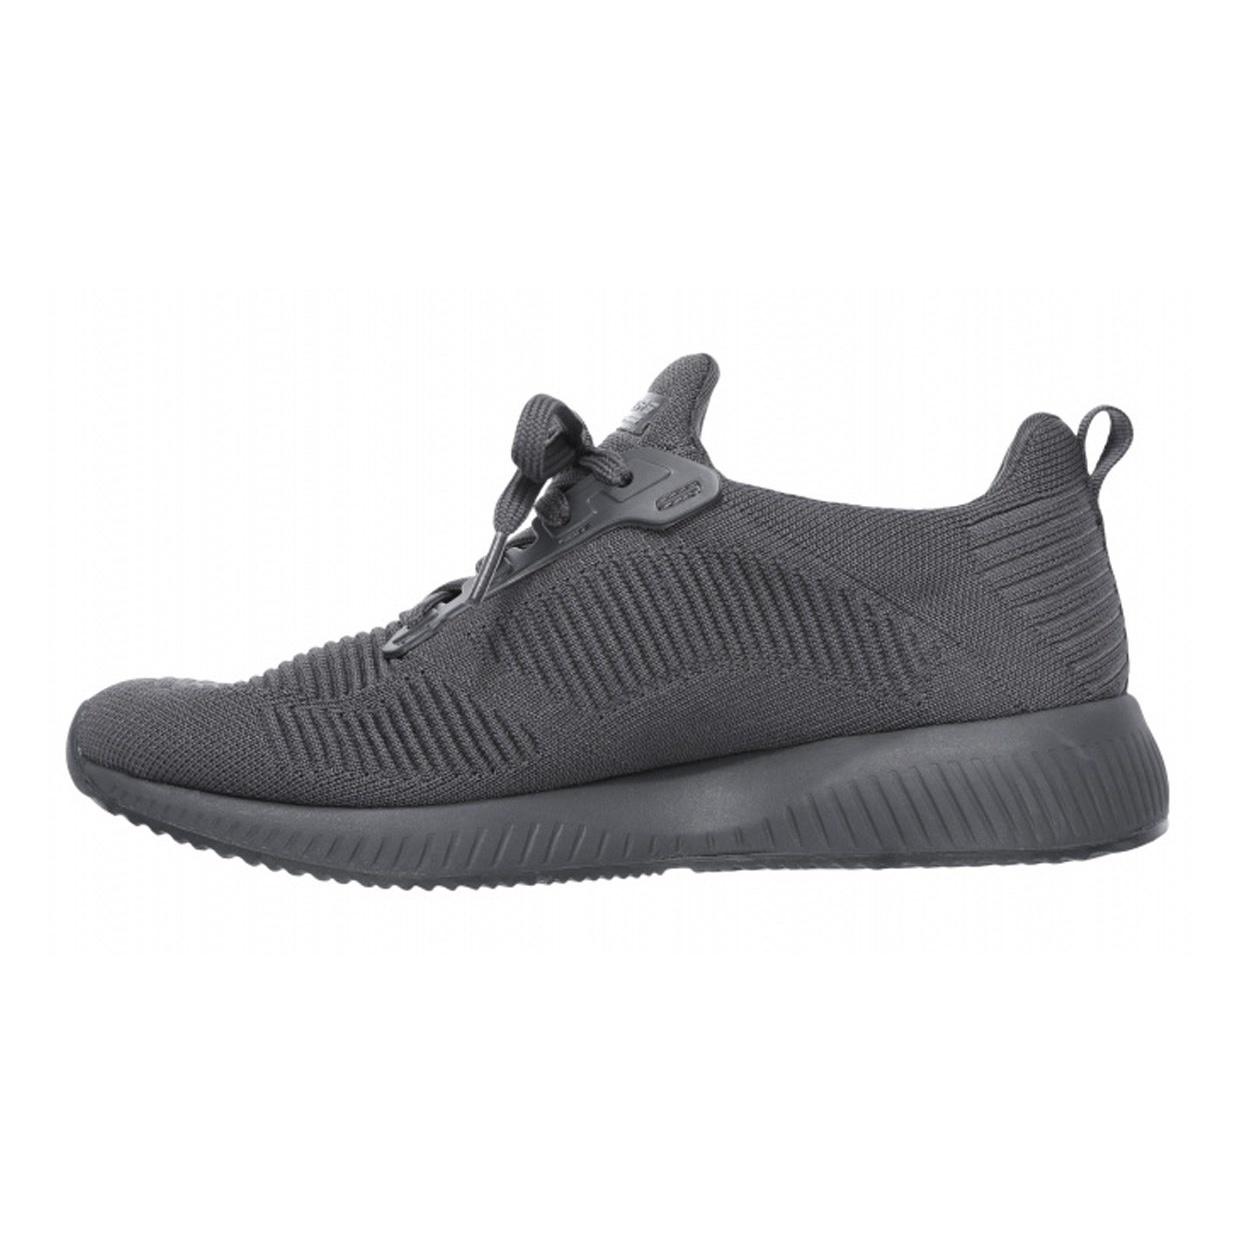 کفش راحتی زنانه اسکچرز مدلMIRACLE 31362CCL